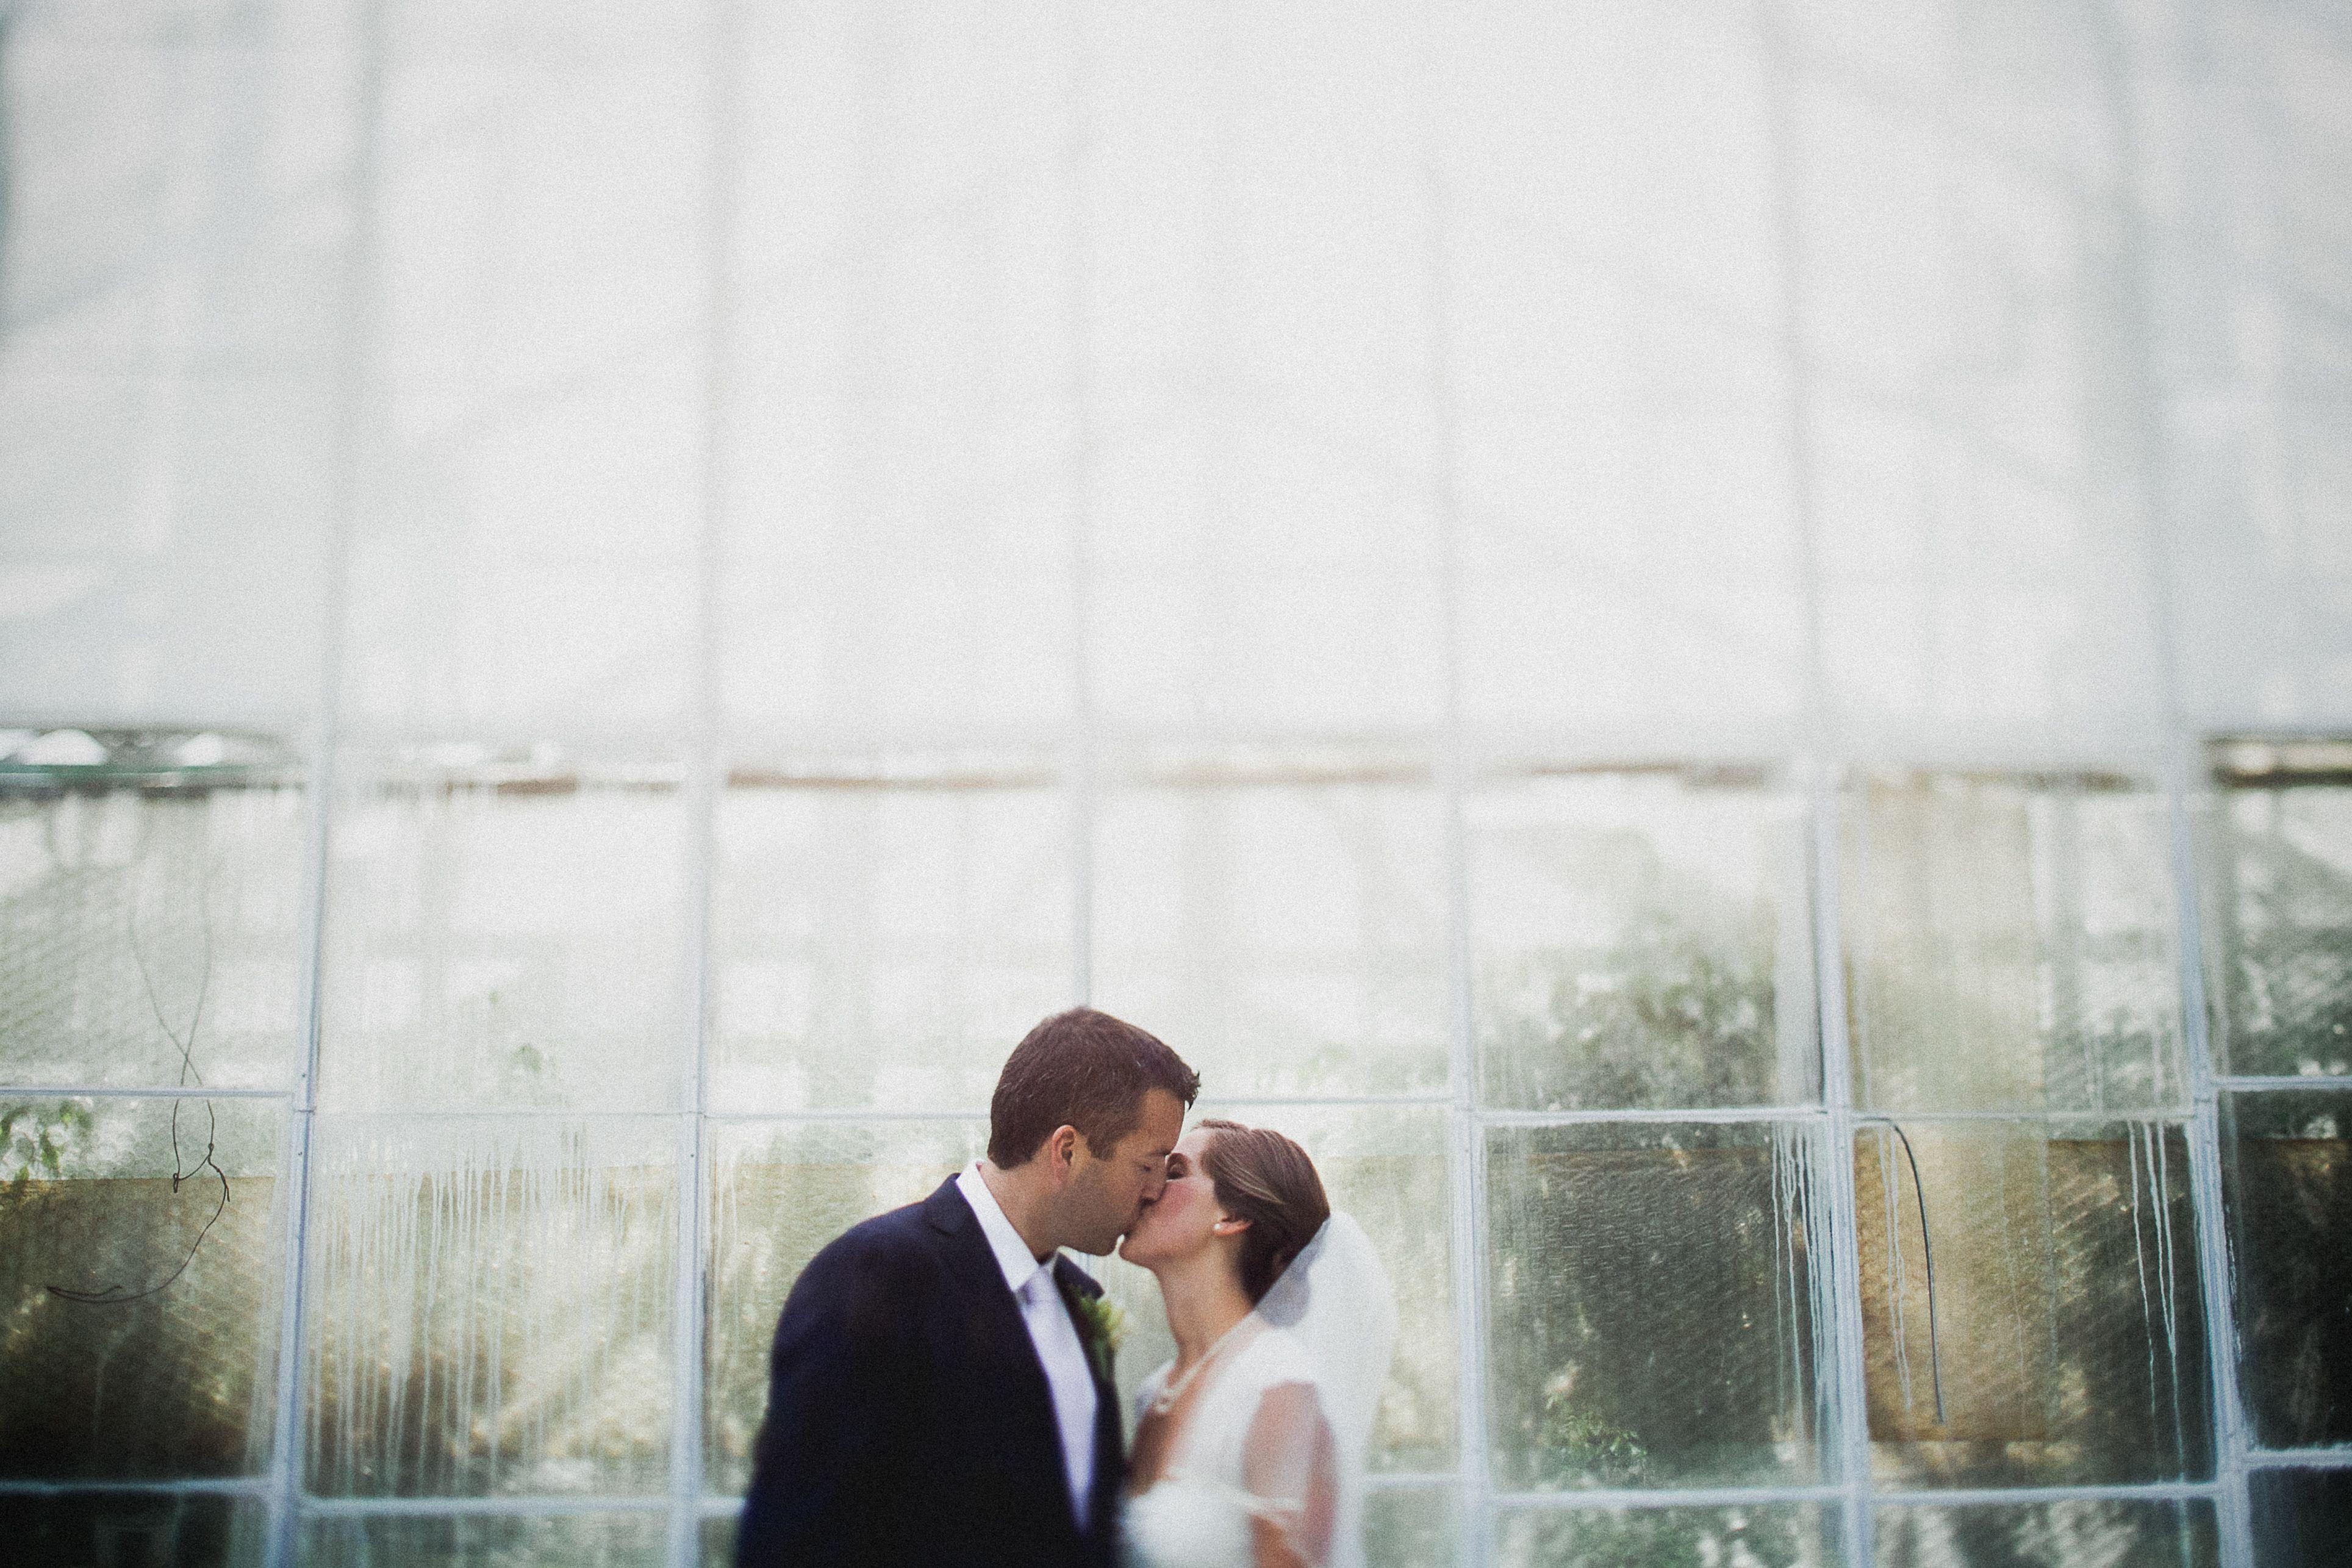 A Classy, Natural Wedding at Philadelphia Horticultural Center in Philadelphia, Pennsylvania